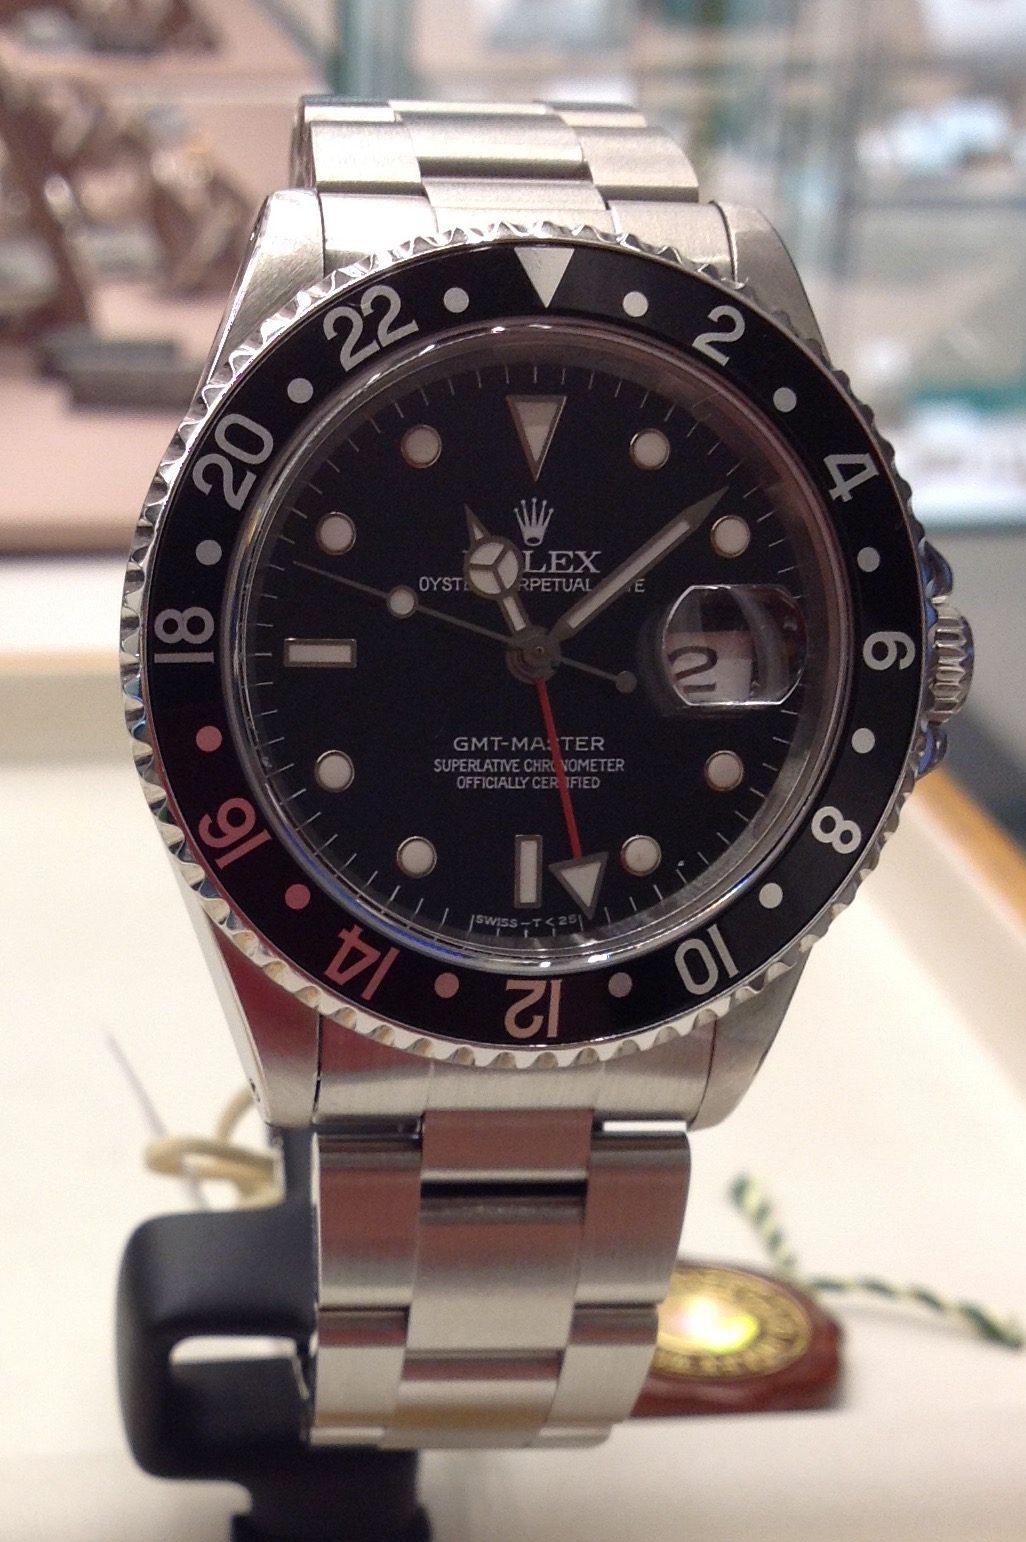 Rolex Datejust GMT MASTER  ref  16700  VENDUTO